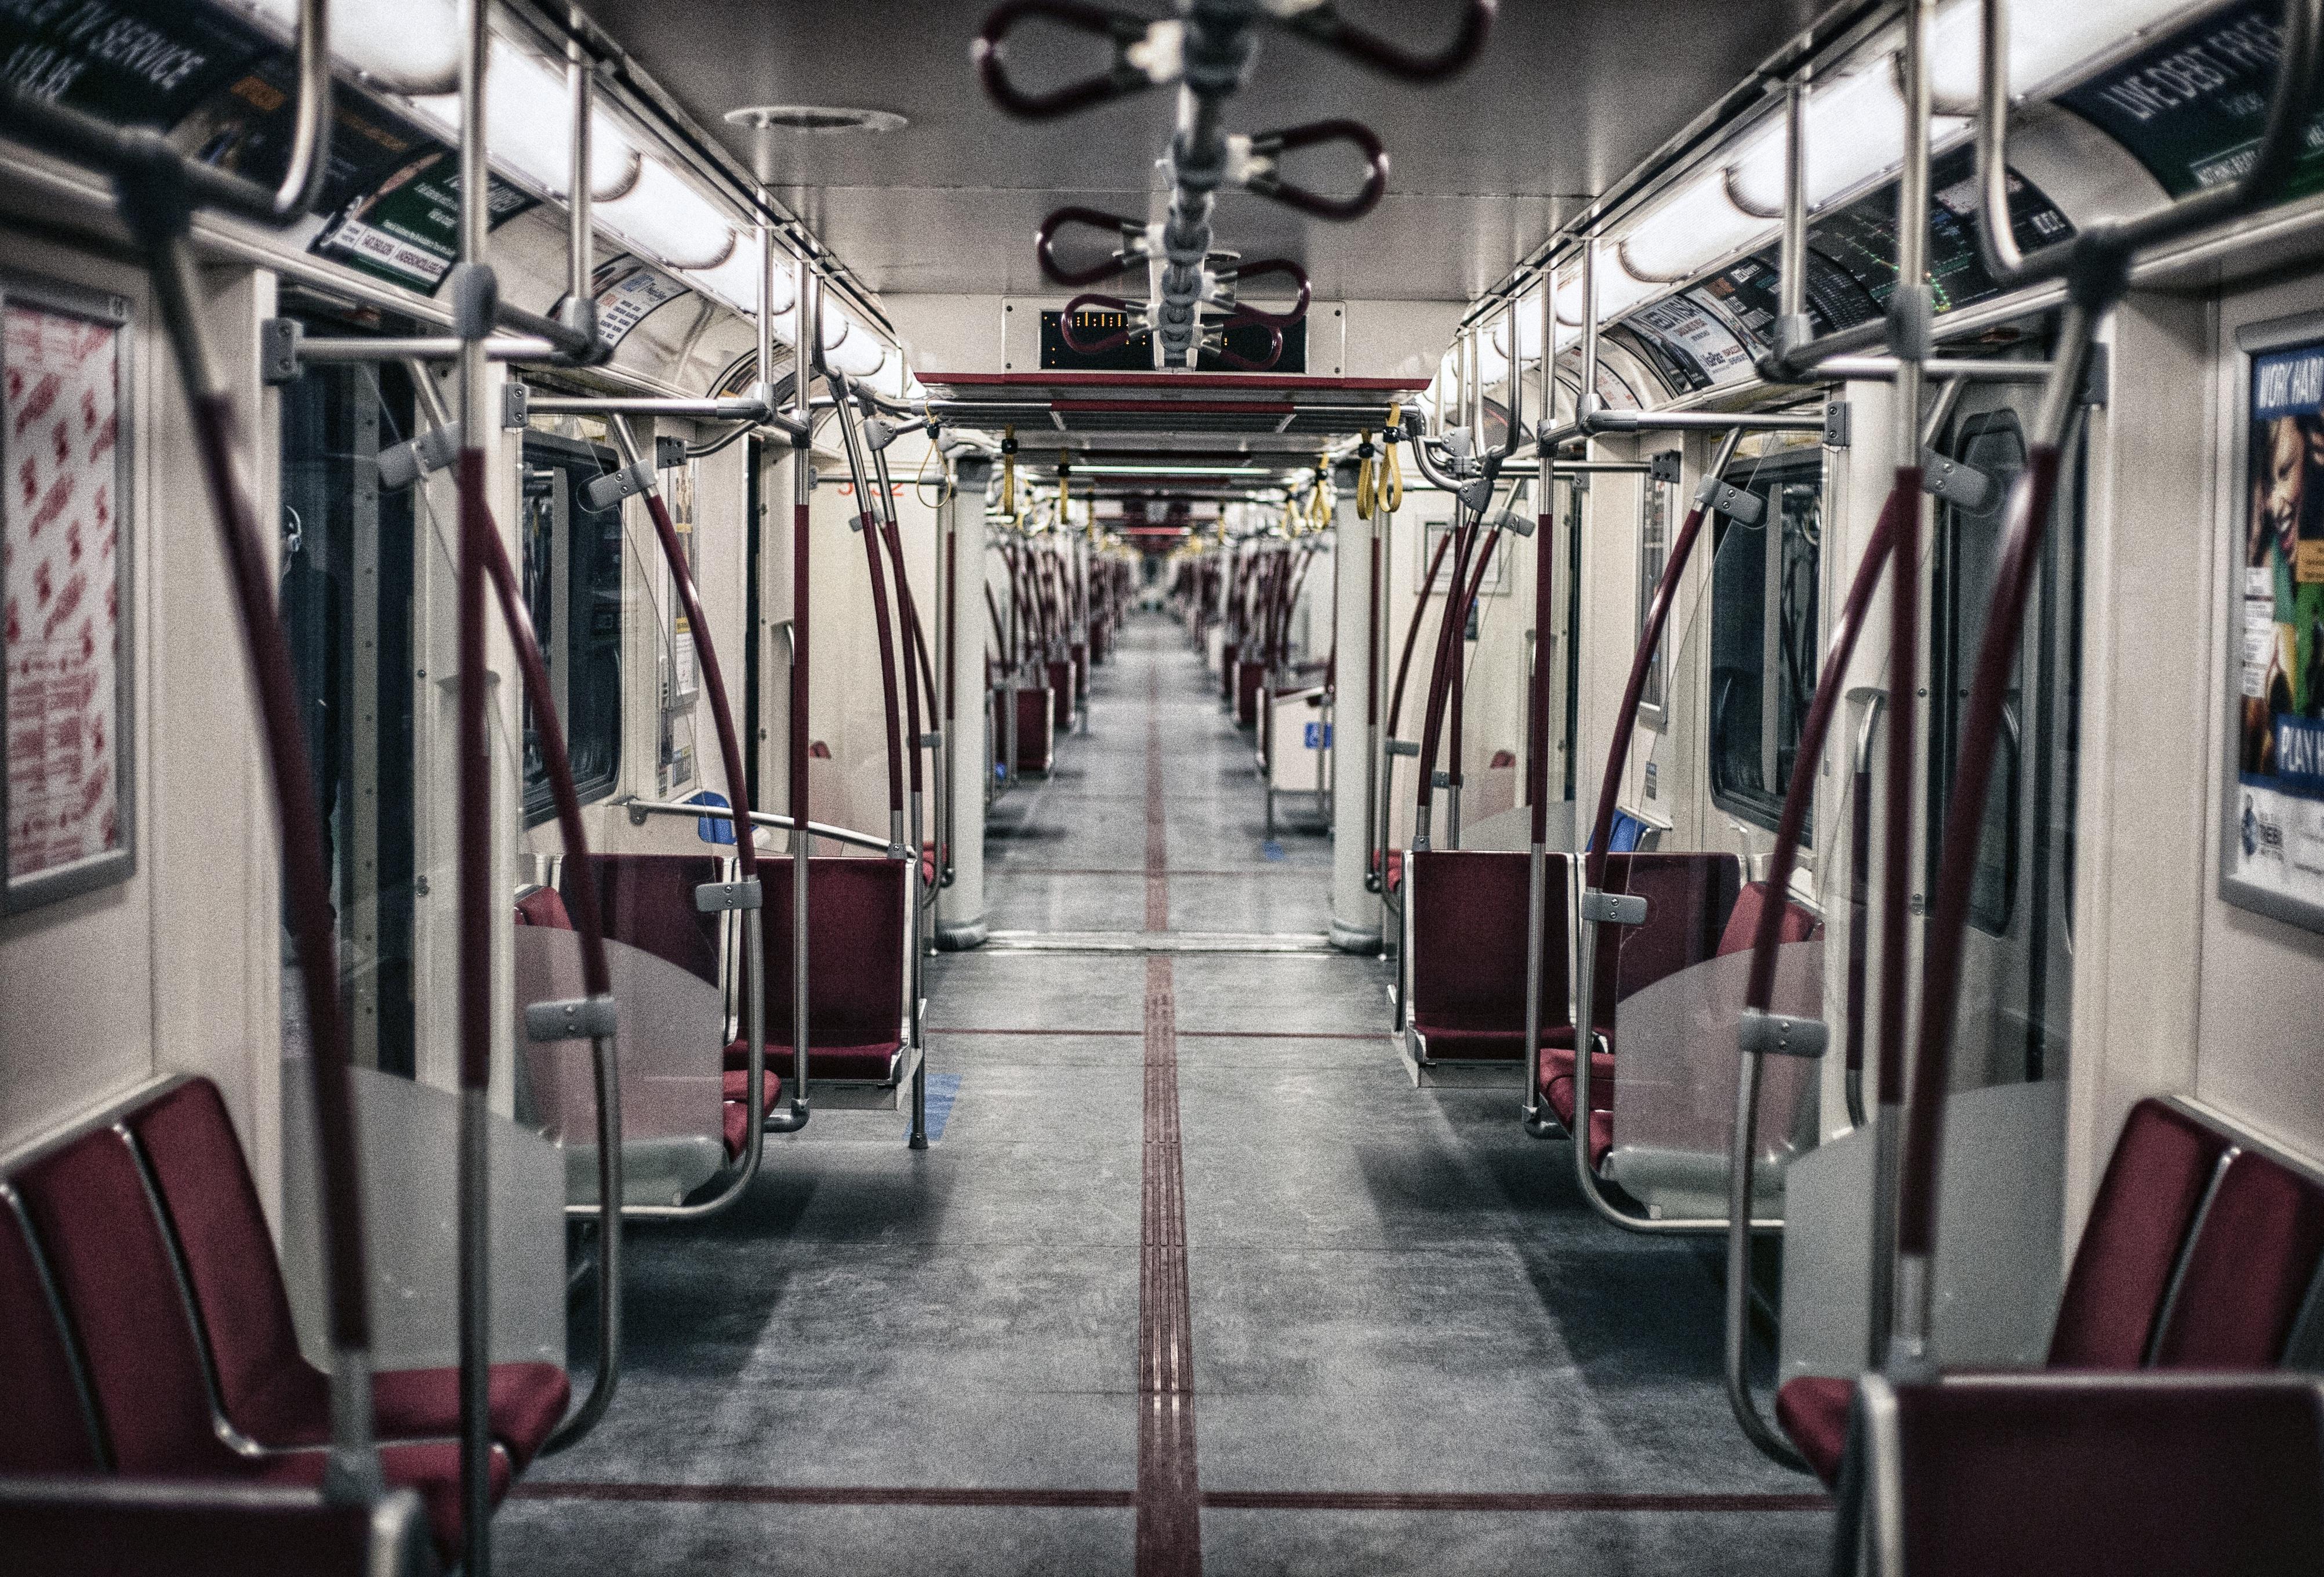 liberating_empty_tube